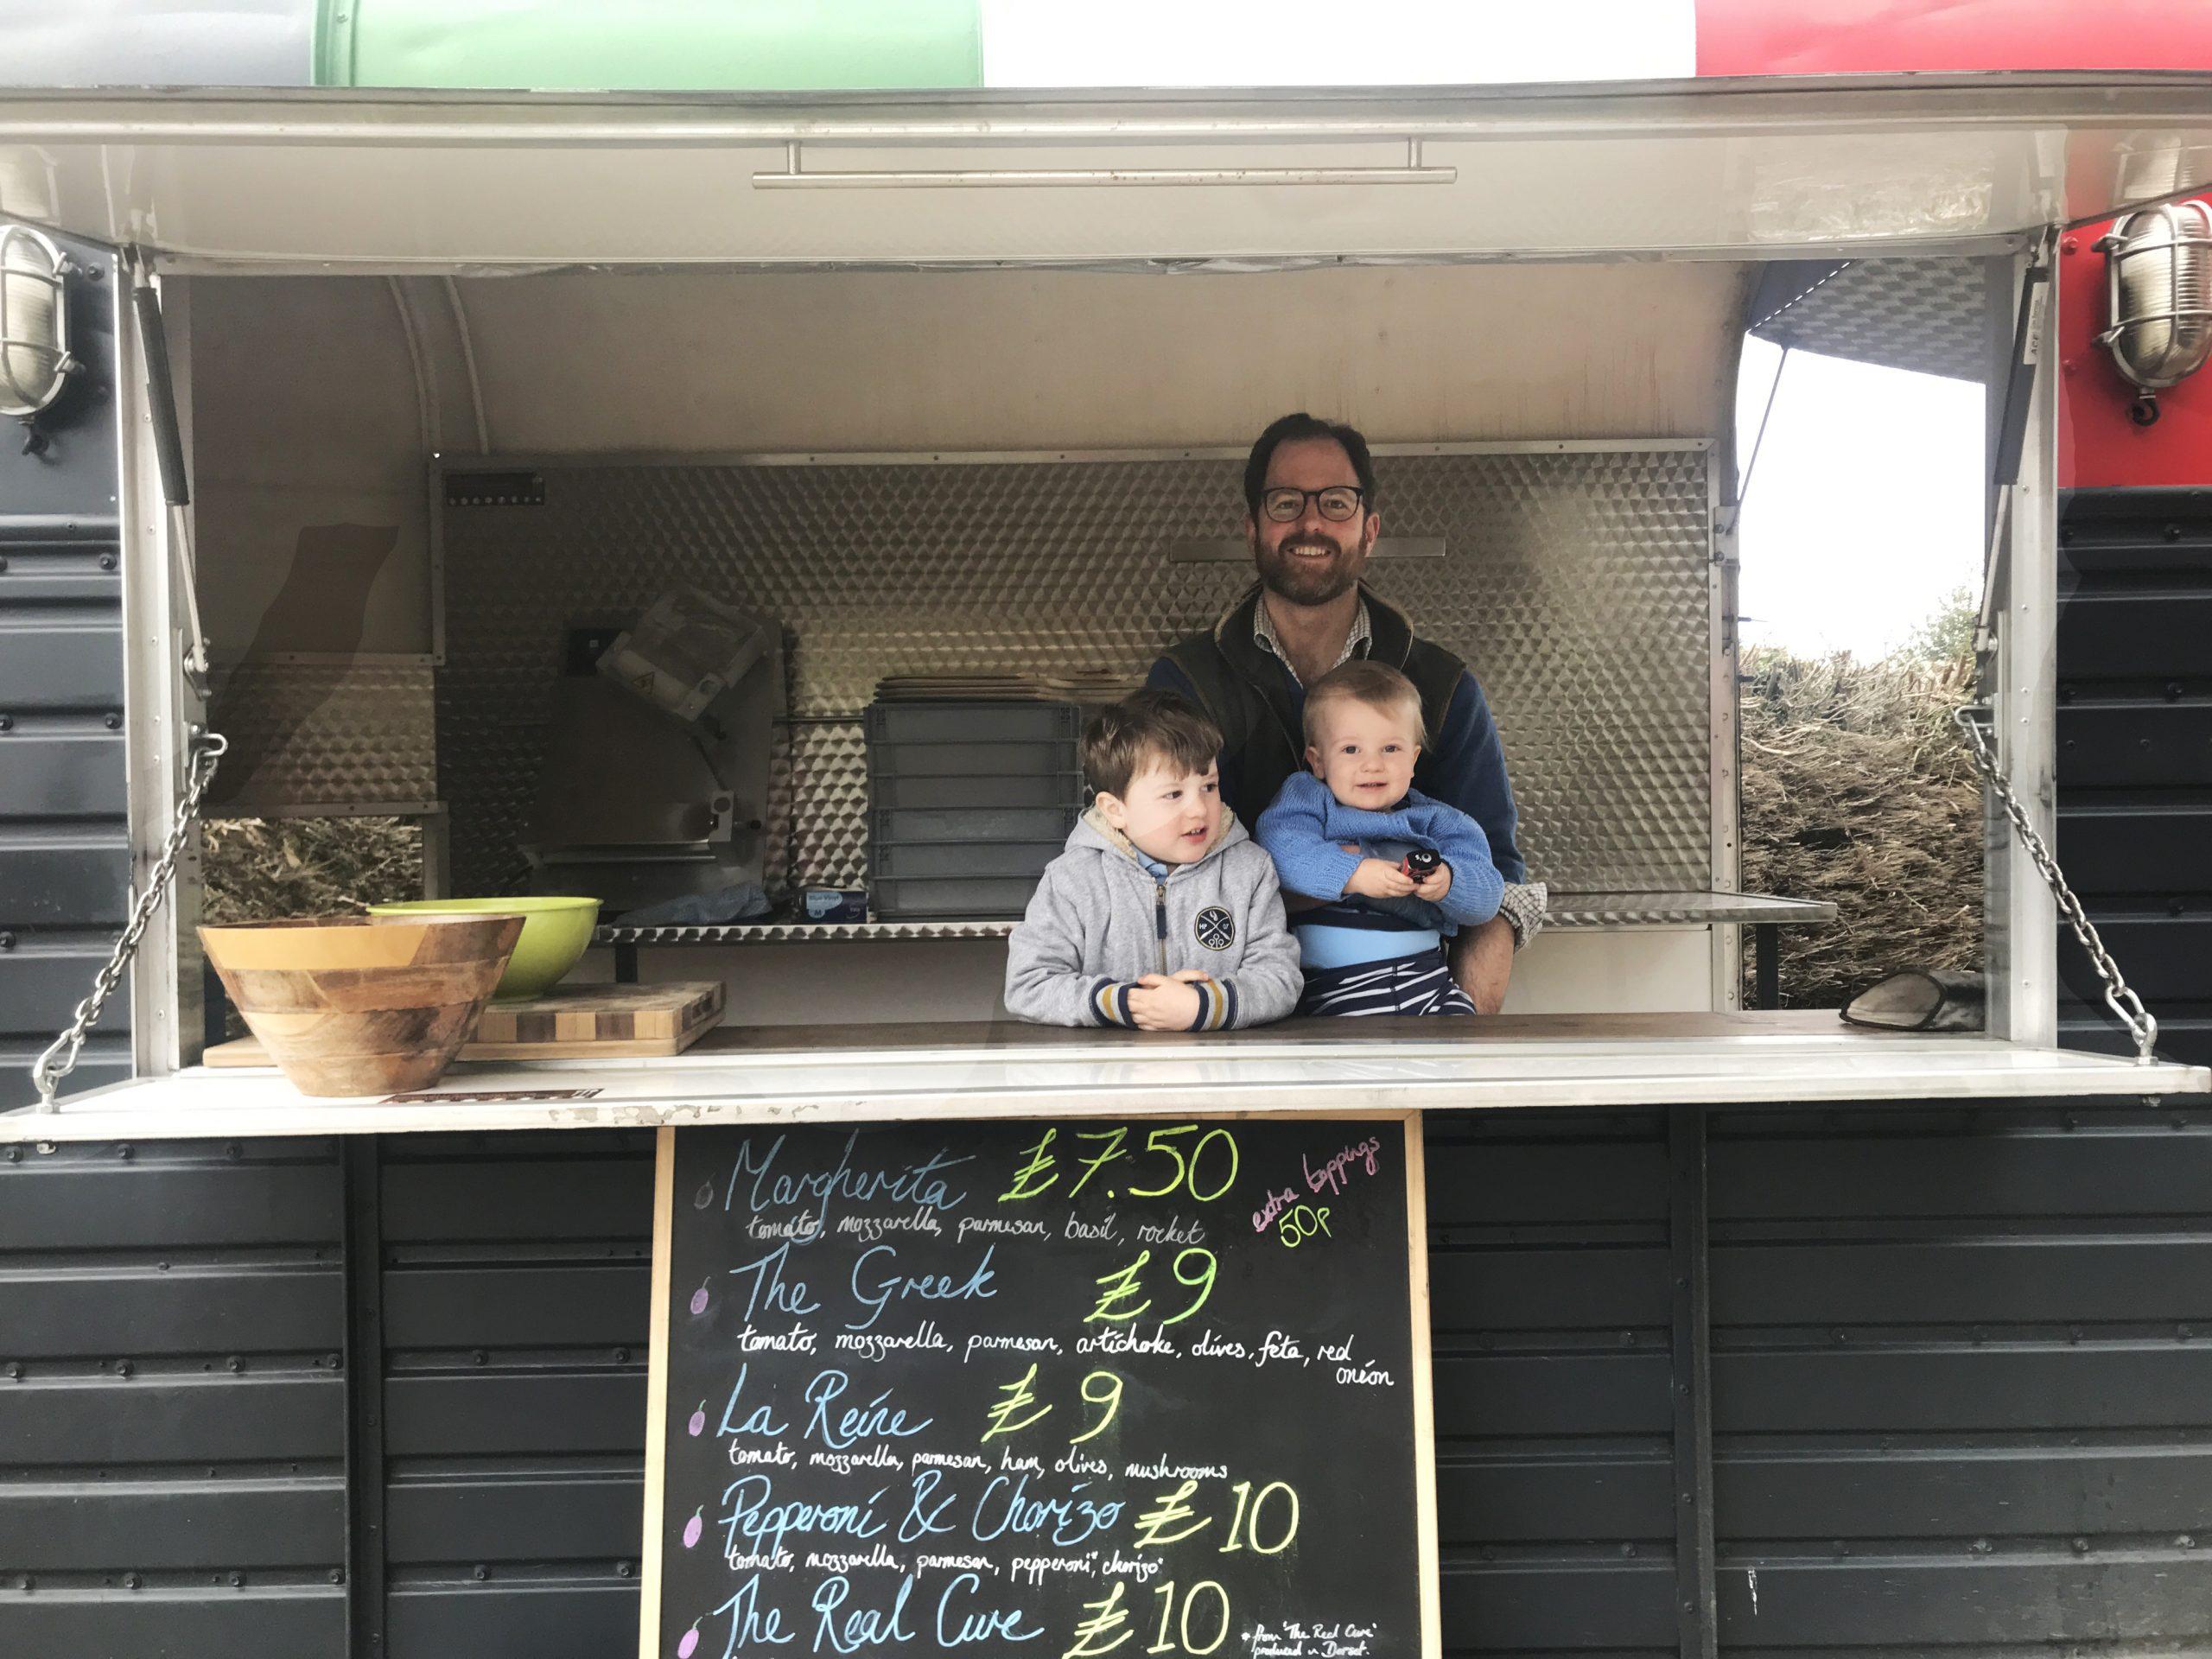 Love Pizzetta - The Family